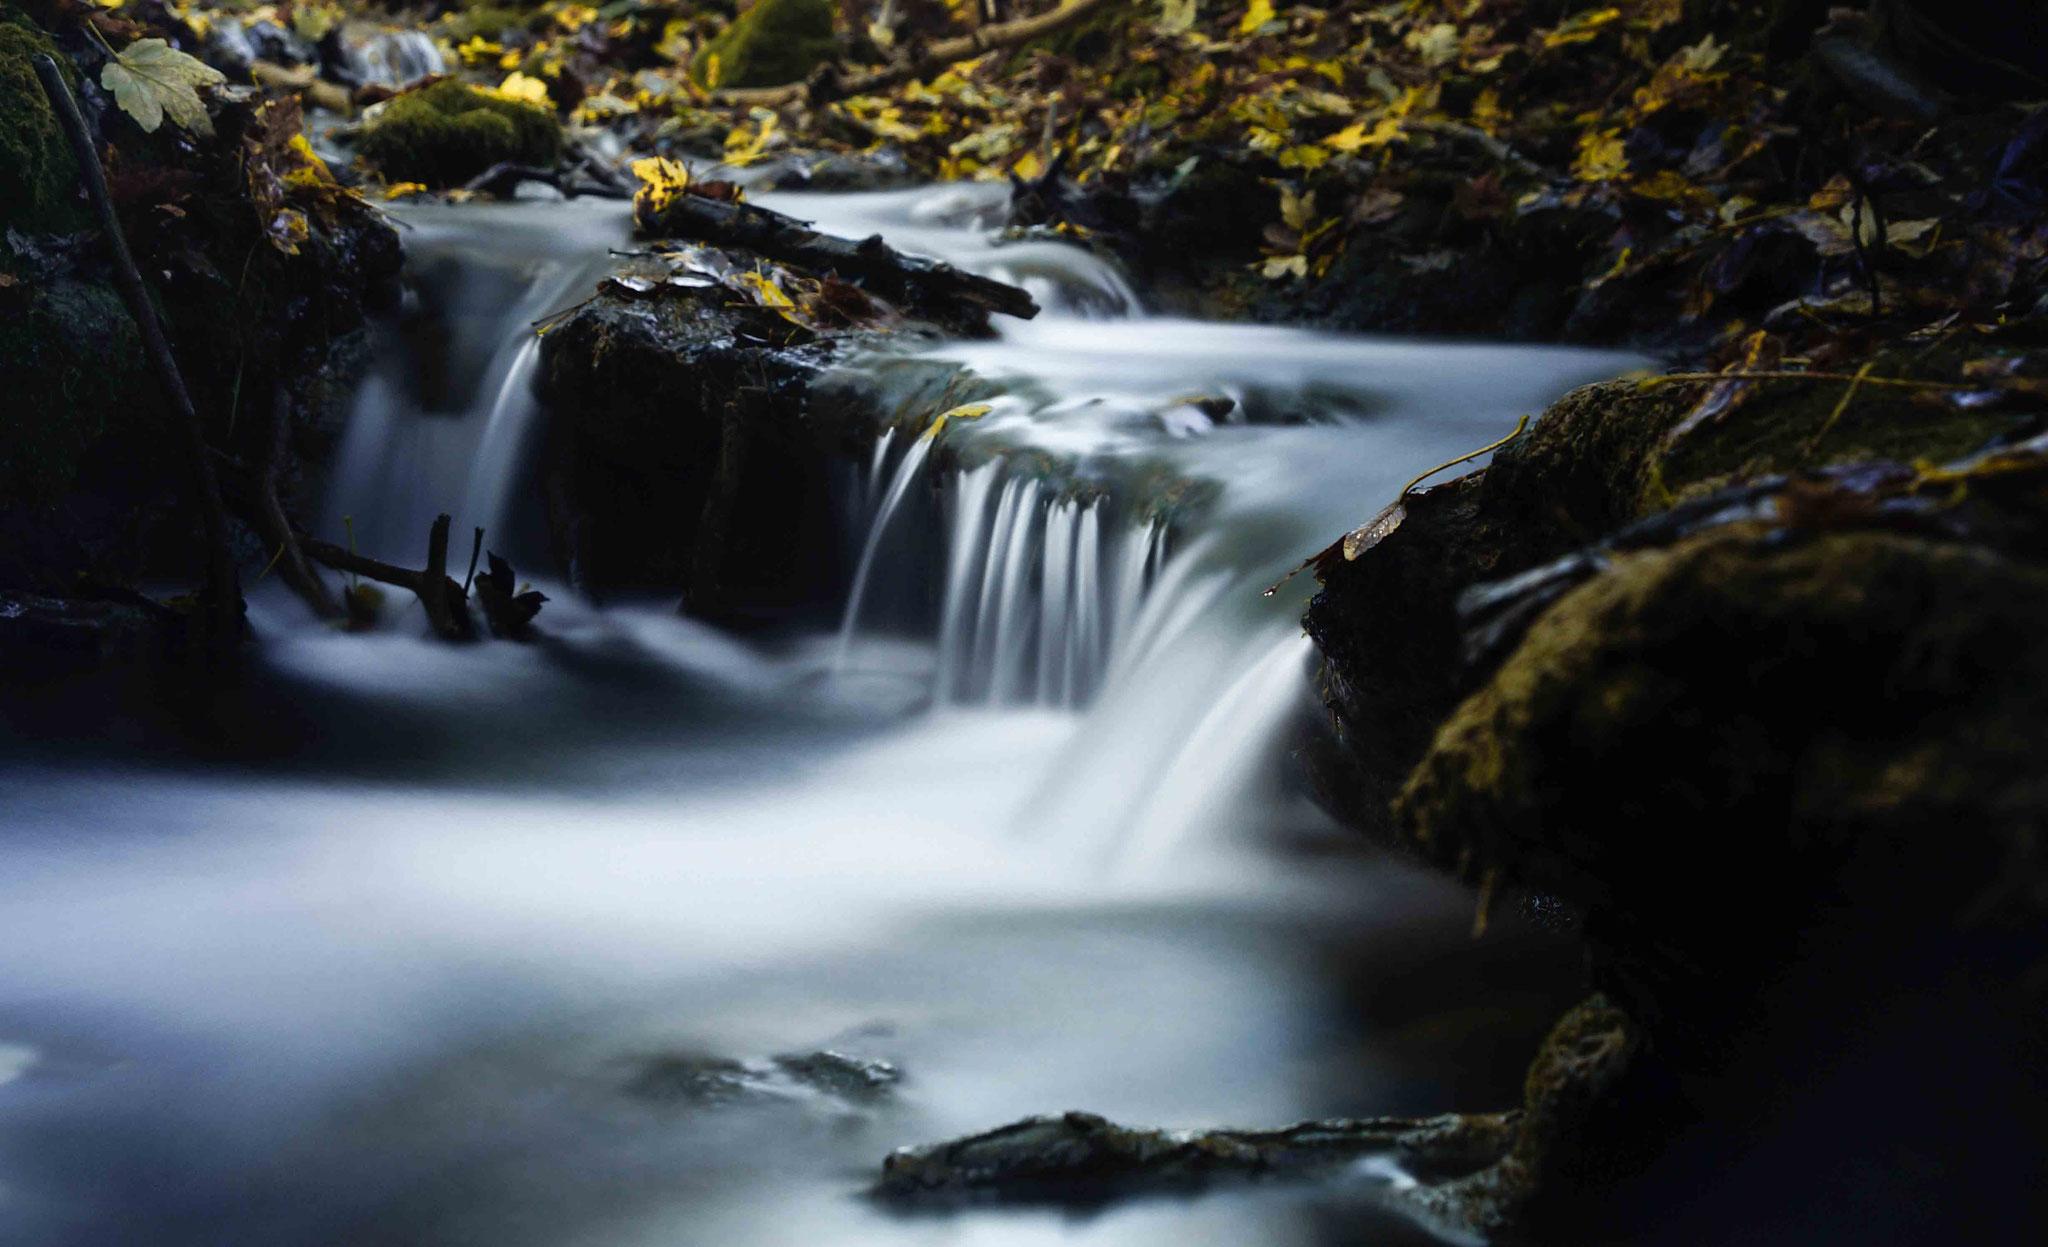 Bachlauf des Brühlbachs; Wasserfall Bad Urach